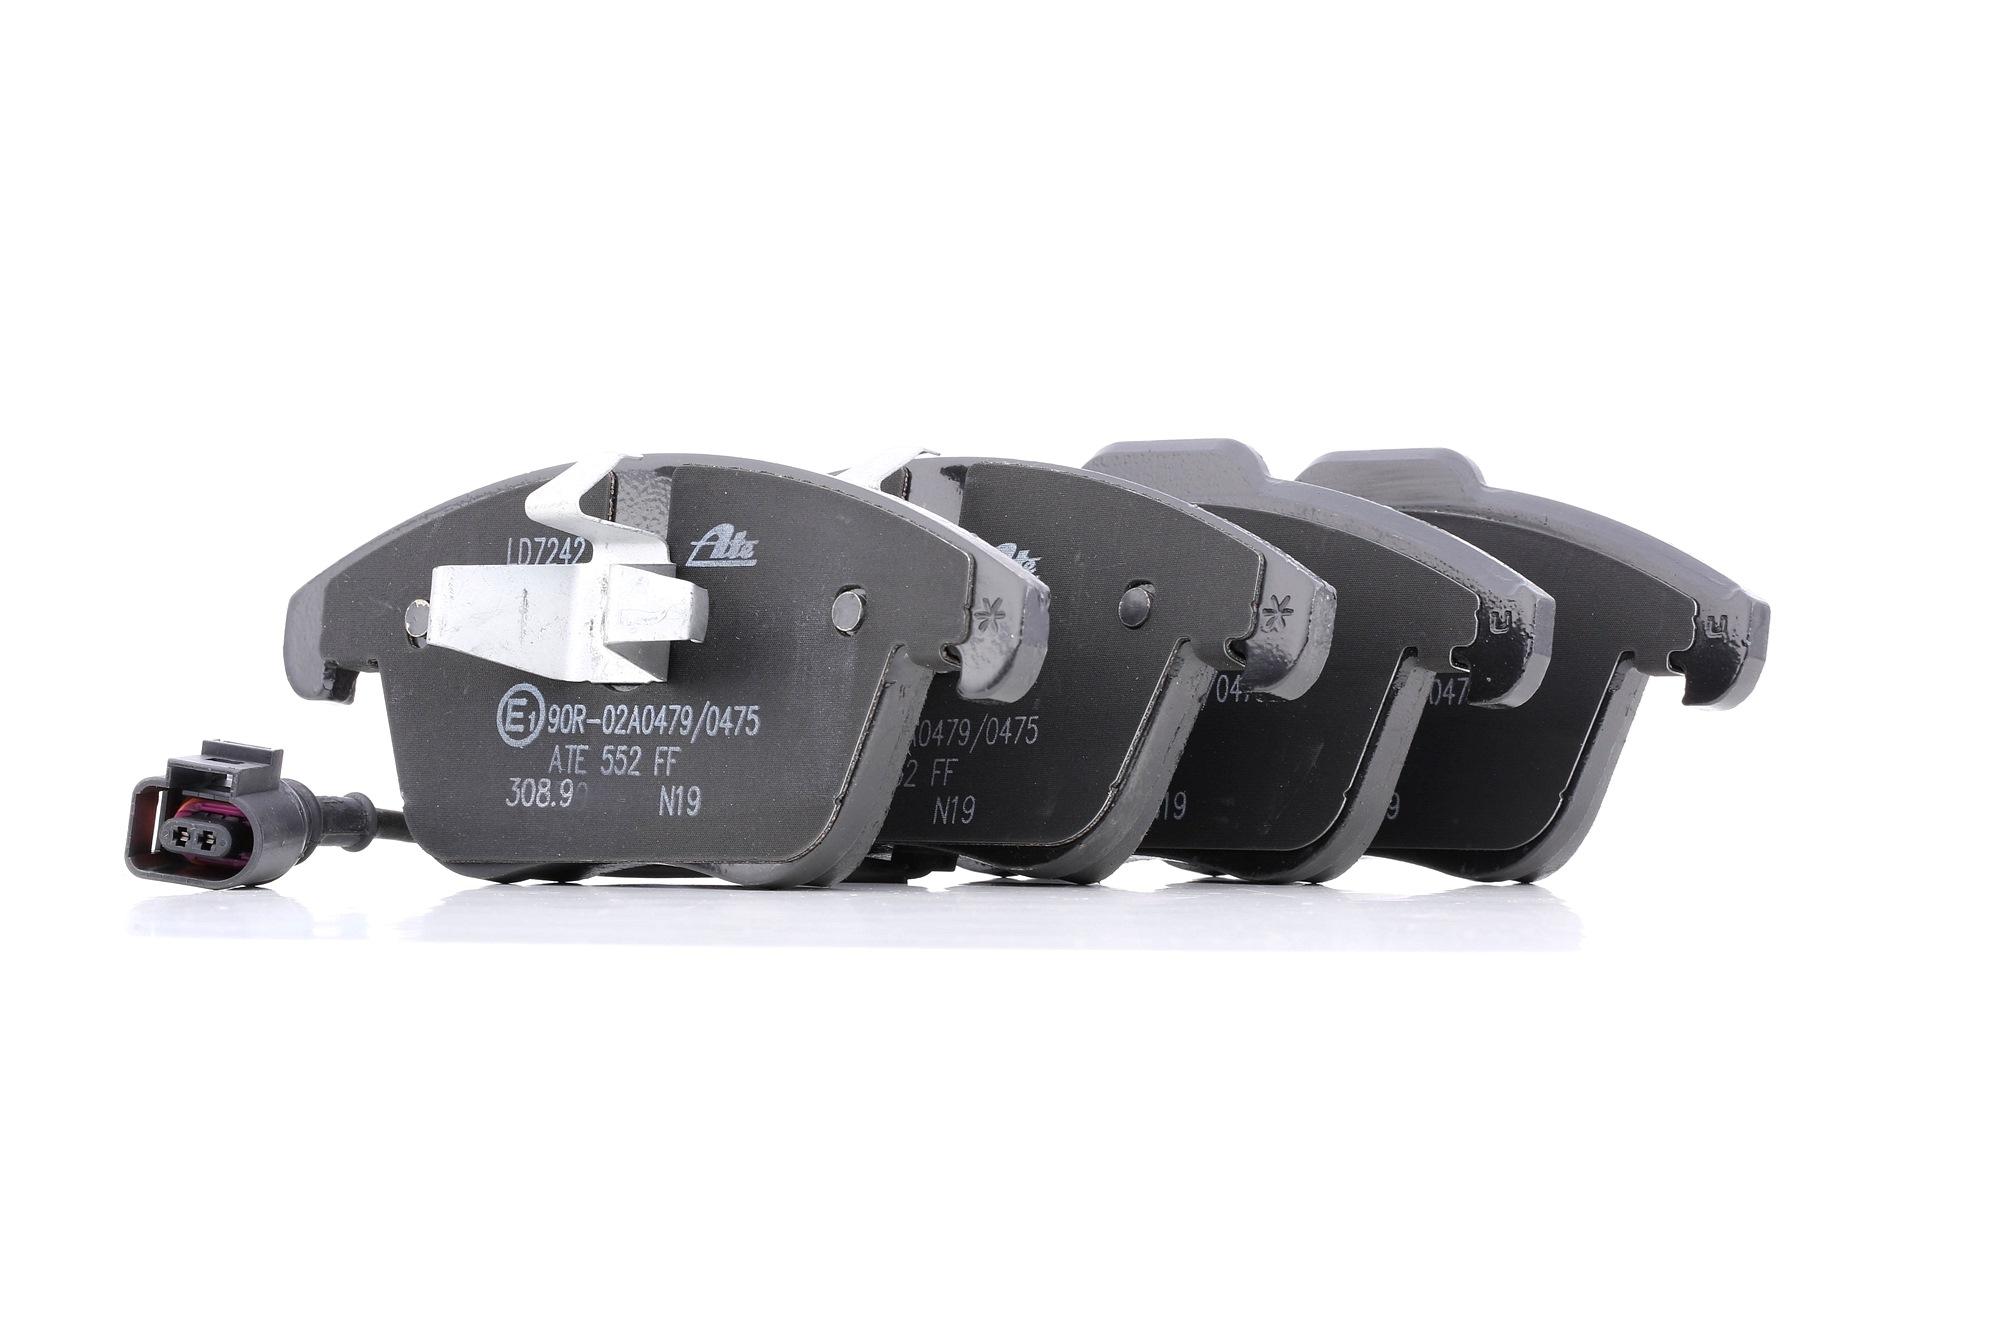 VW TIGUAN 2013 Tuning - Original ATE 13.0470-7242.2 Höhe 1: 72,0mm, Höhe 2: 67,0mm, Breite 1: 155,1mm, Breite 2: 155,1mm, Dicke/Stärke 1: 19,8mm, Dicke/Stärke 2: 21,3mm